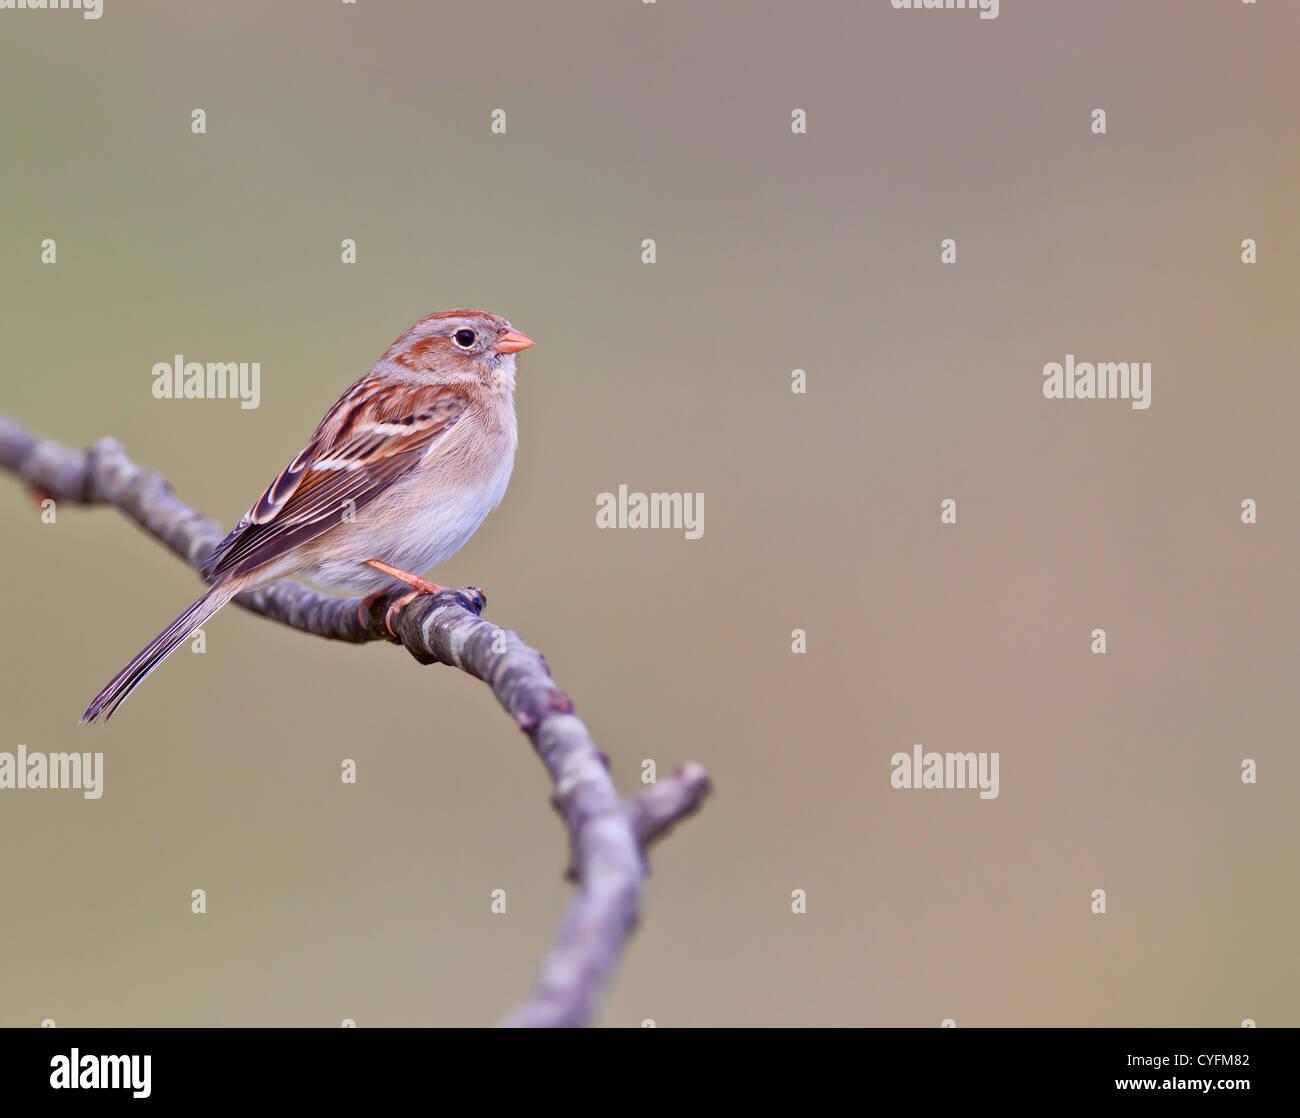 Field Sparrow, Spizella pusilla - Stock Image